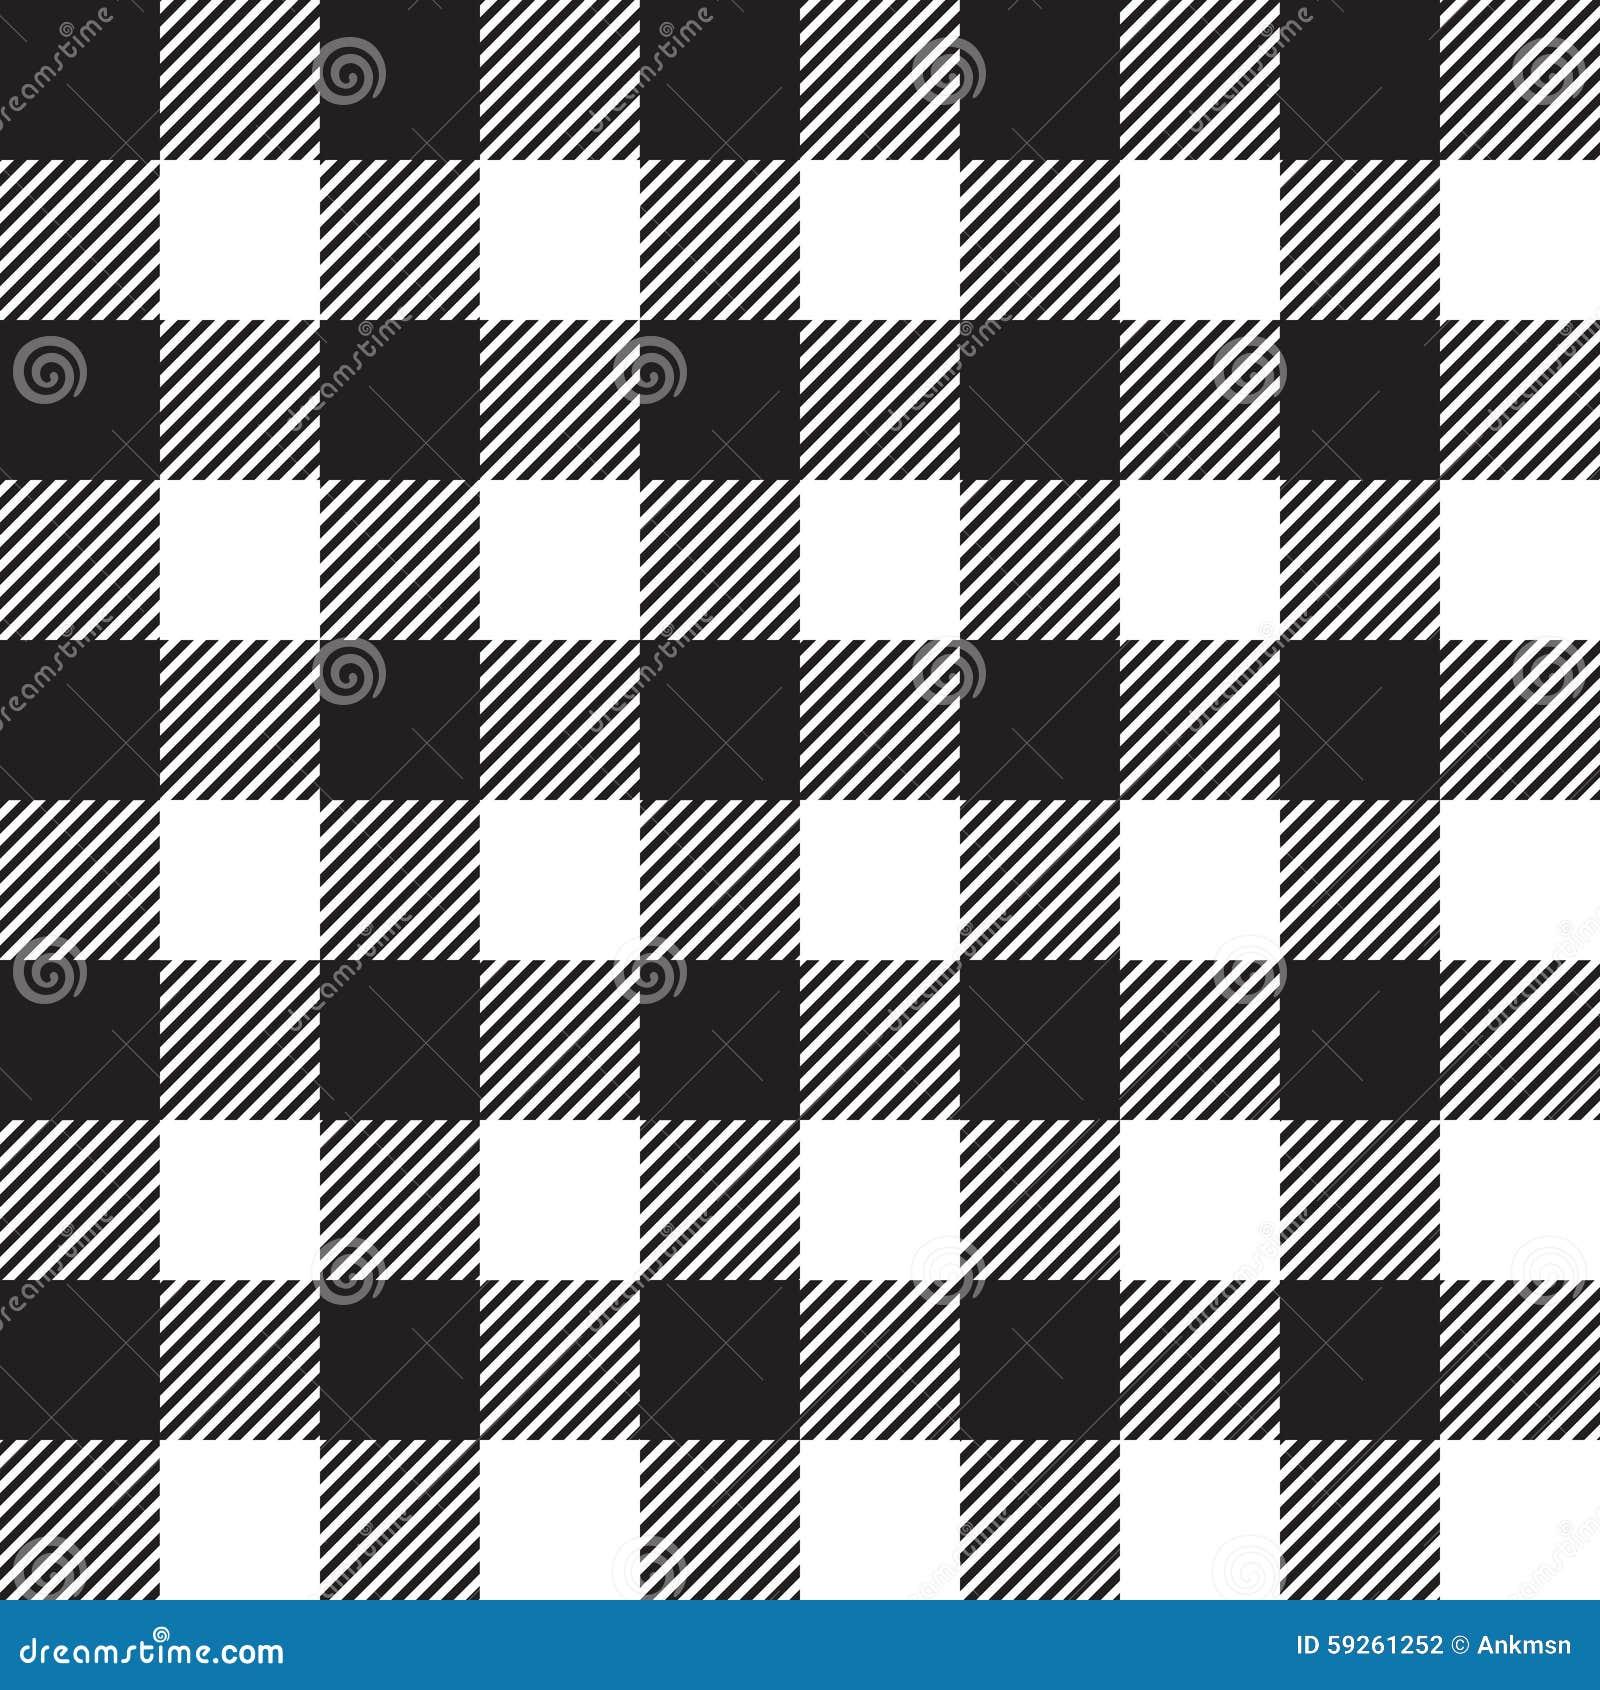 Black Tablecloth Seamless Pattern